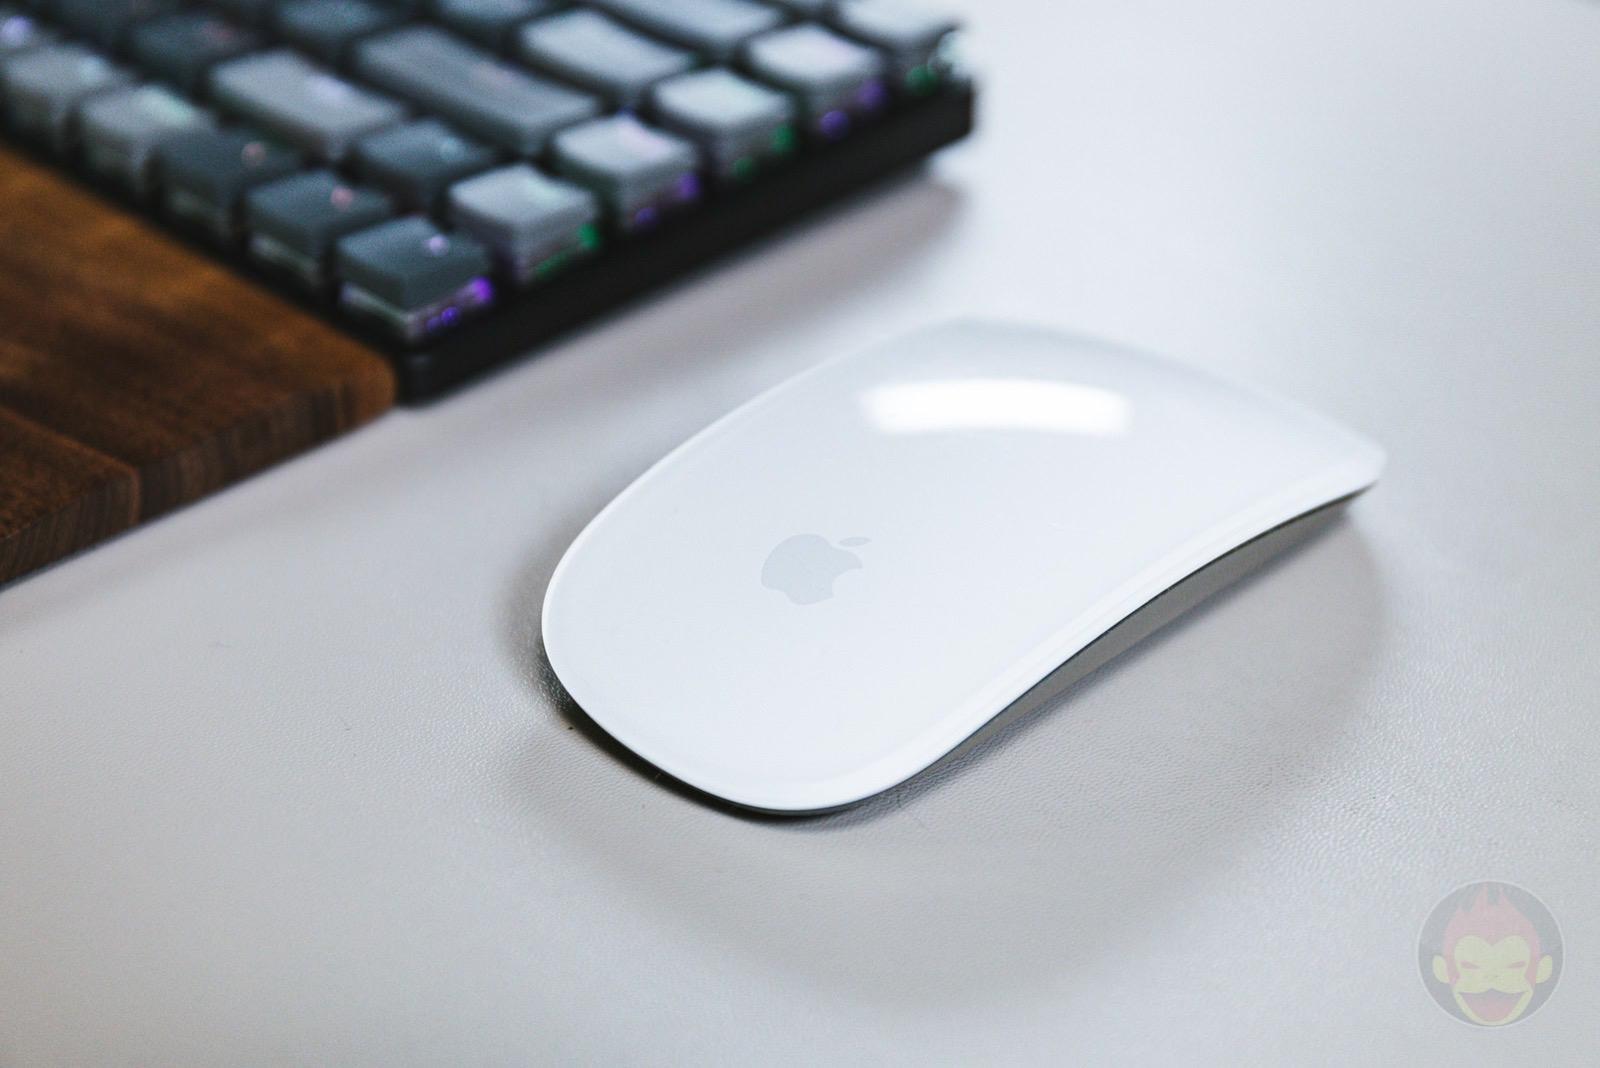 Apple-magic-mouse-01.jpg